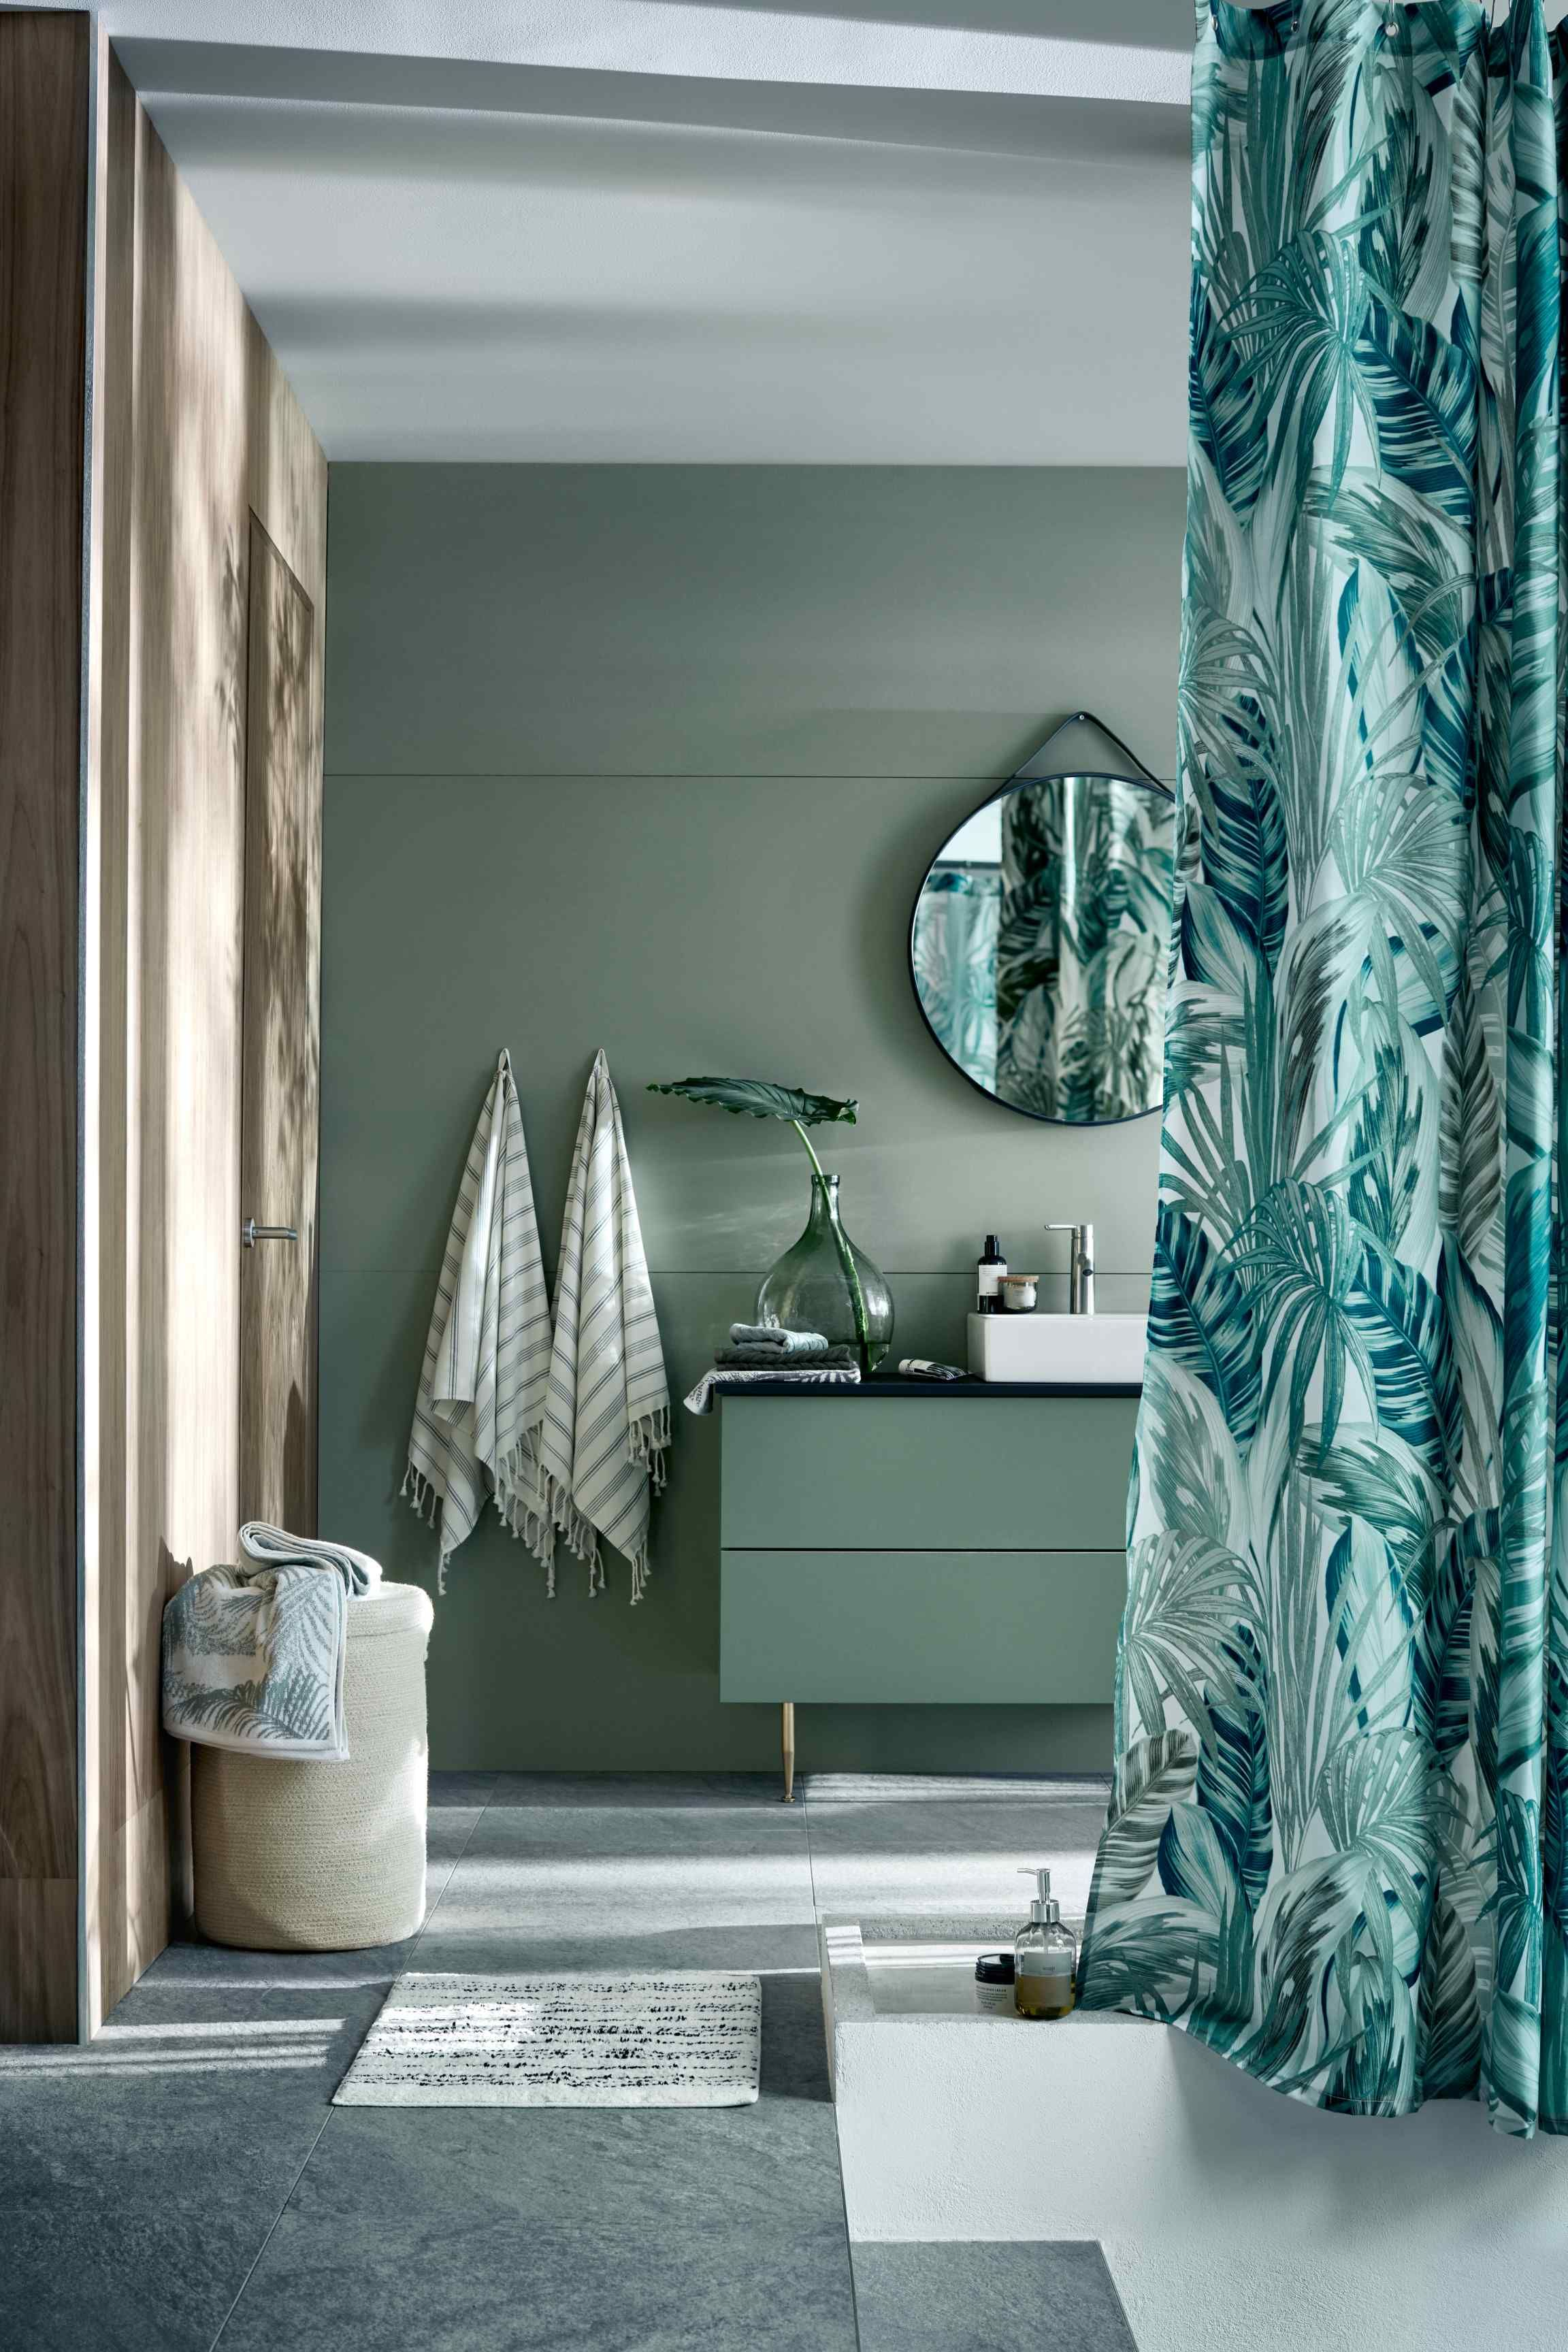 Meuble Salle De Bain Boheme ~ shower curtain pinterest shower curtain ring beach cottages and